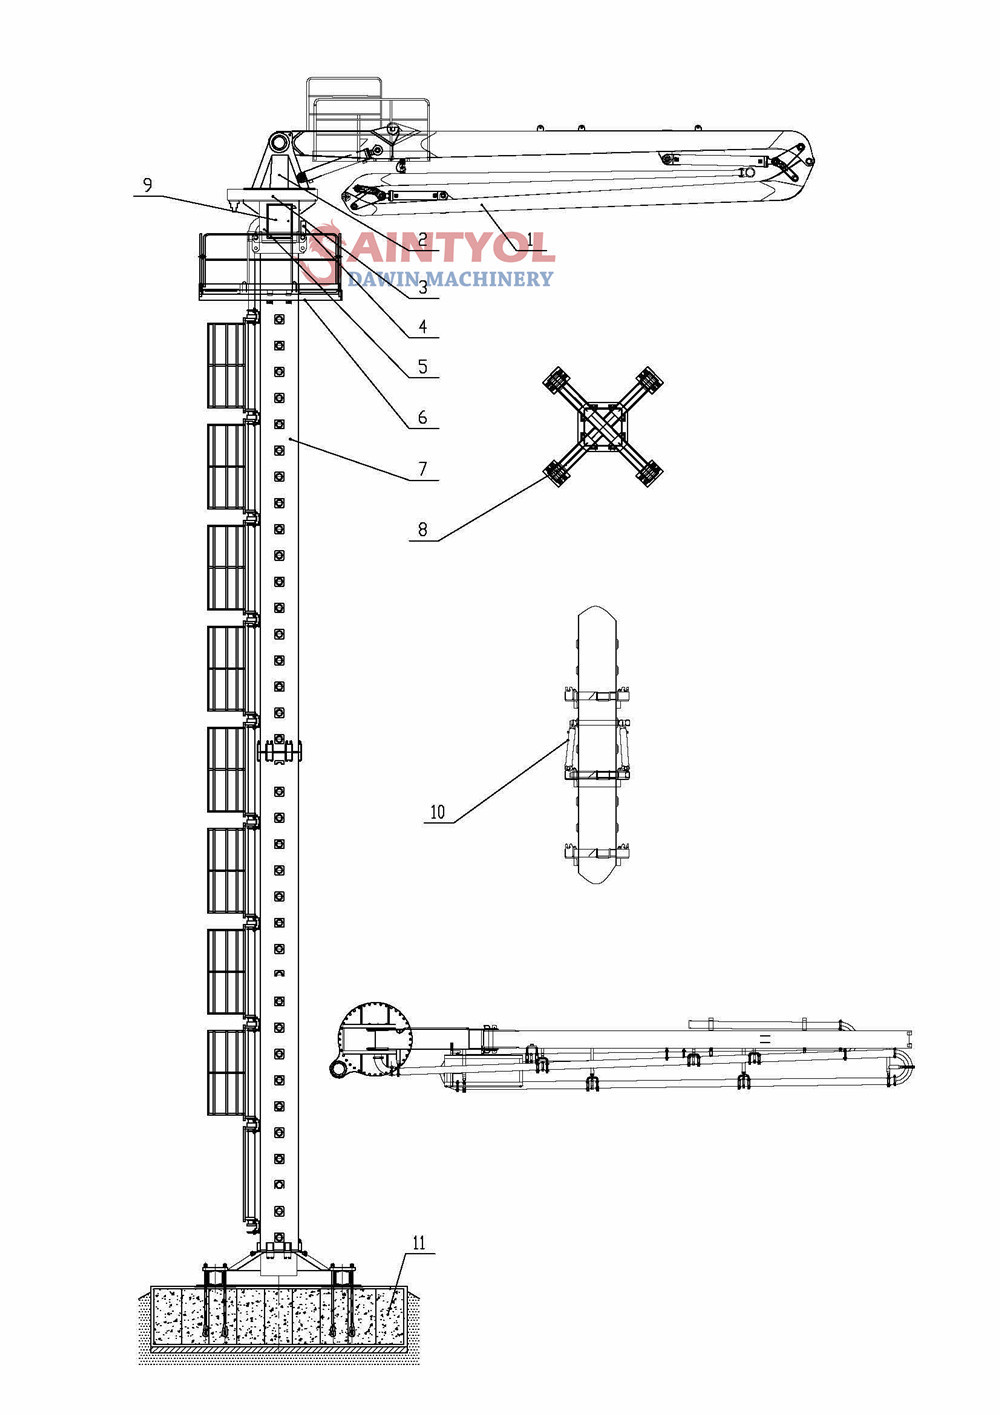 29m stationary hydraulic concrete placing boom